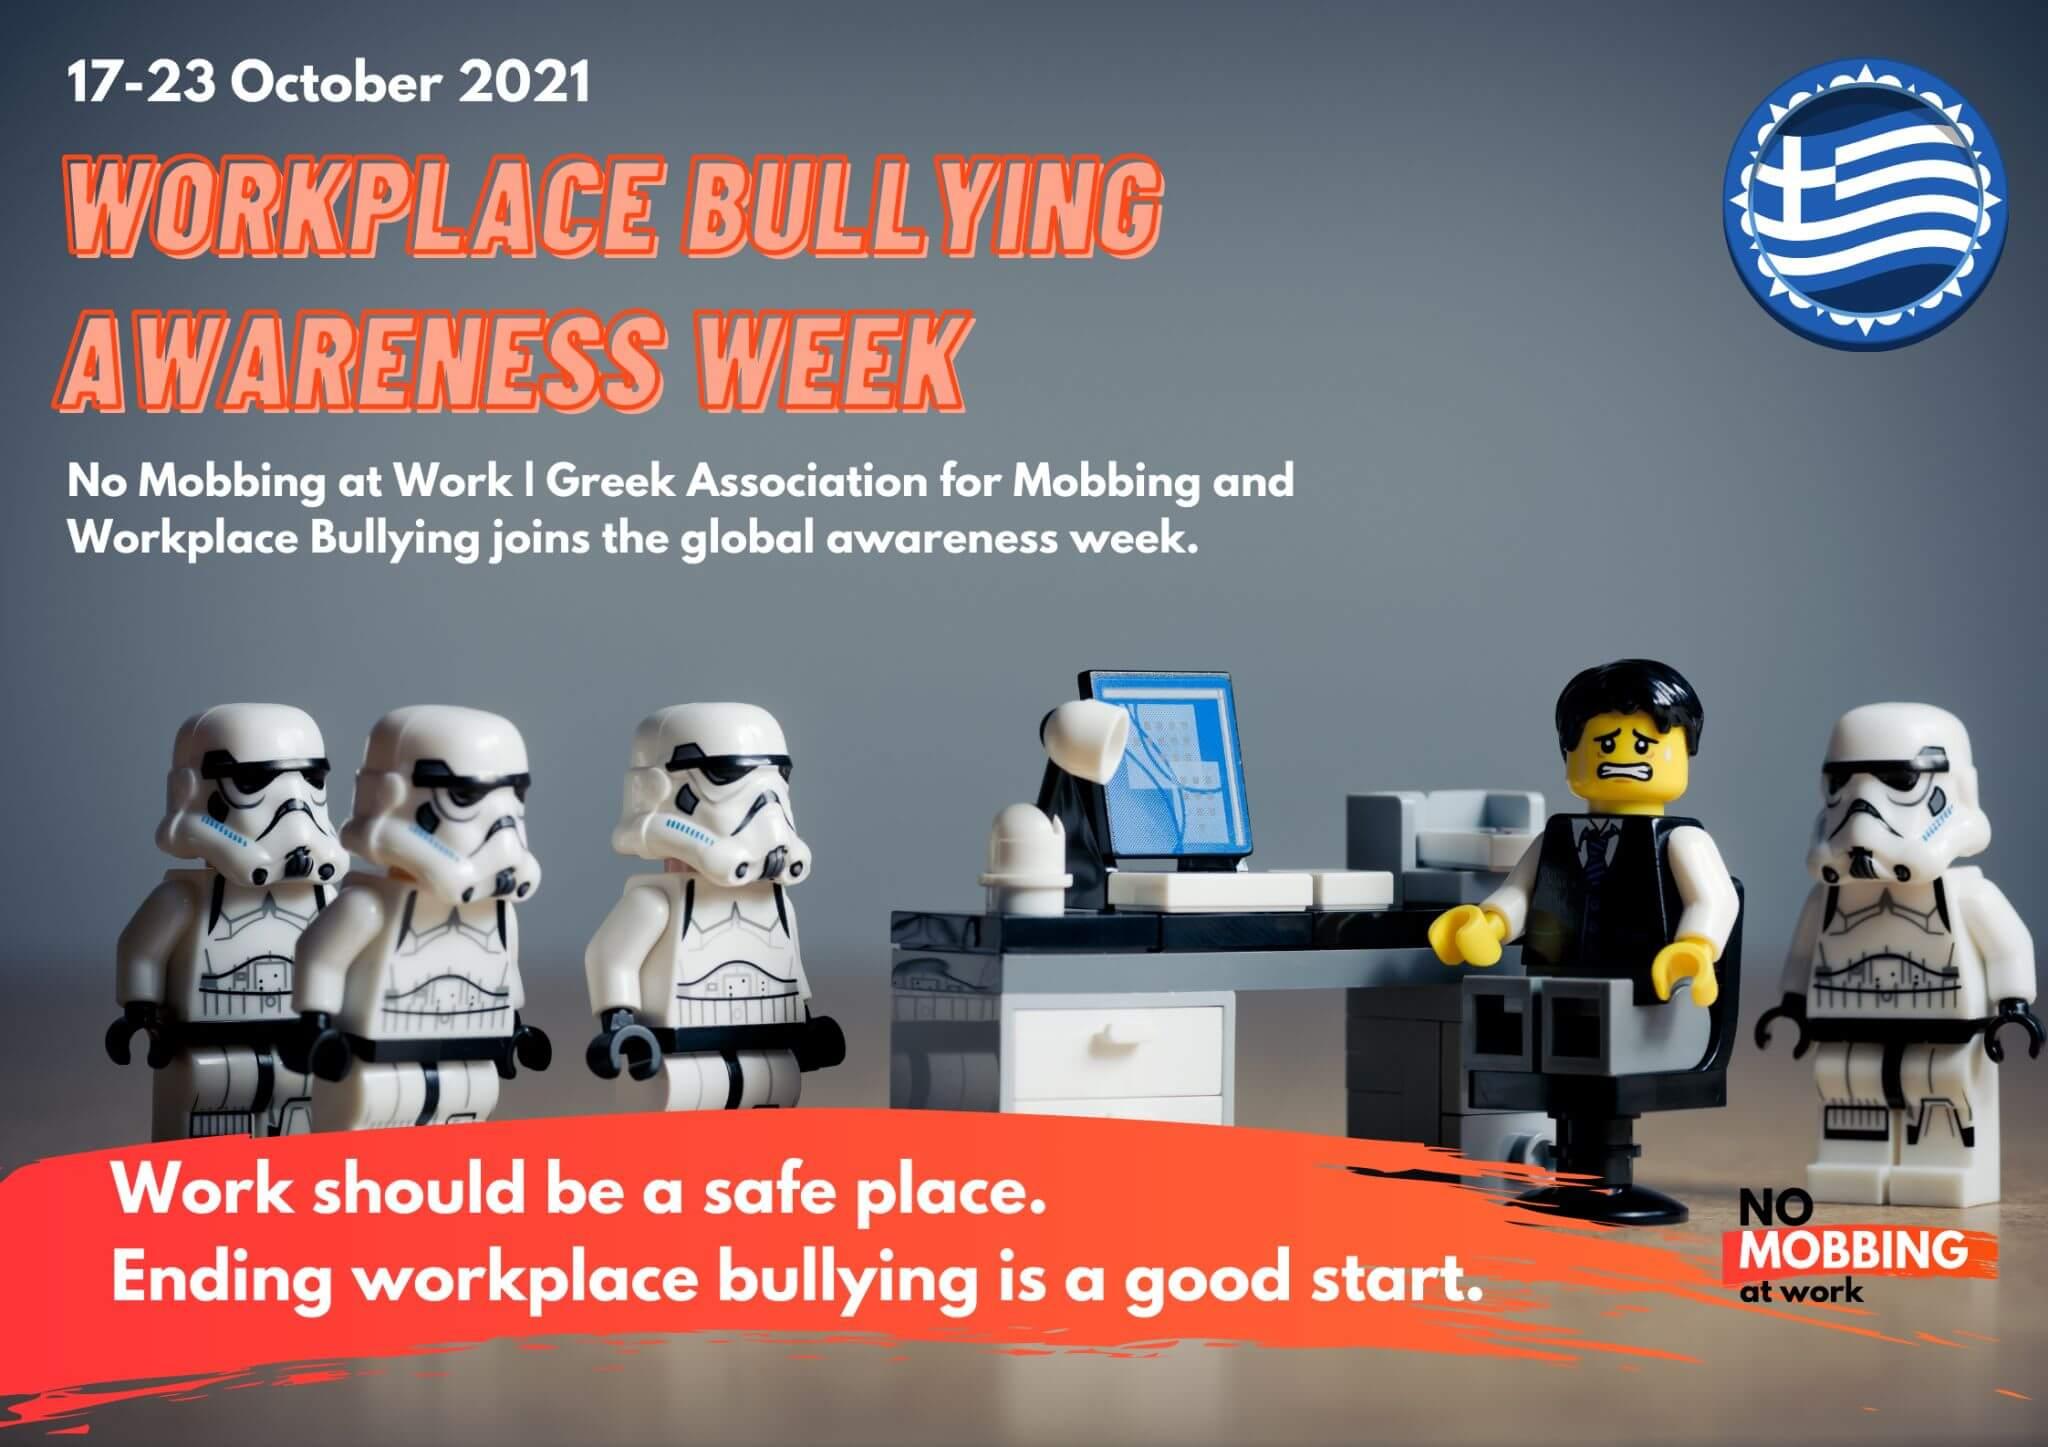 Workplace Bullying Awareness Week 2021, Greece